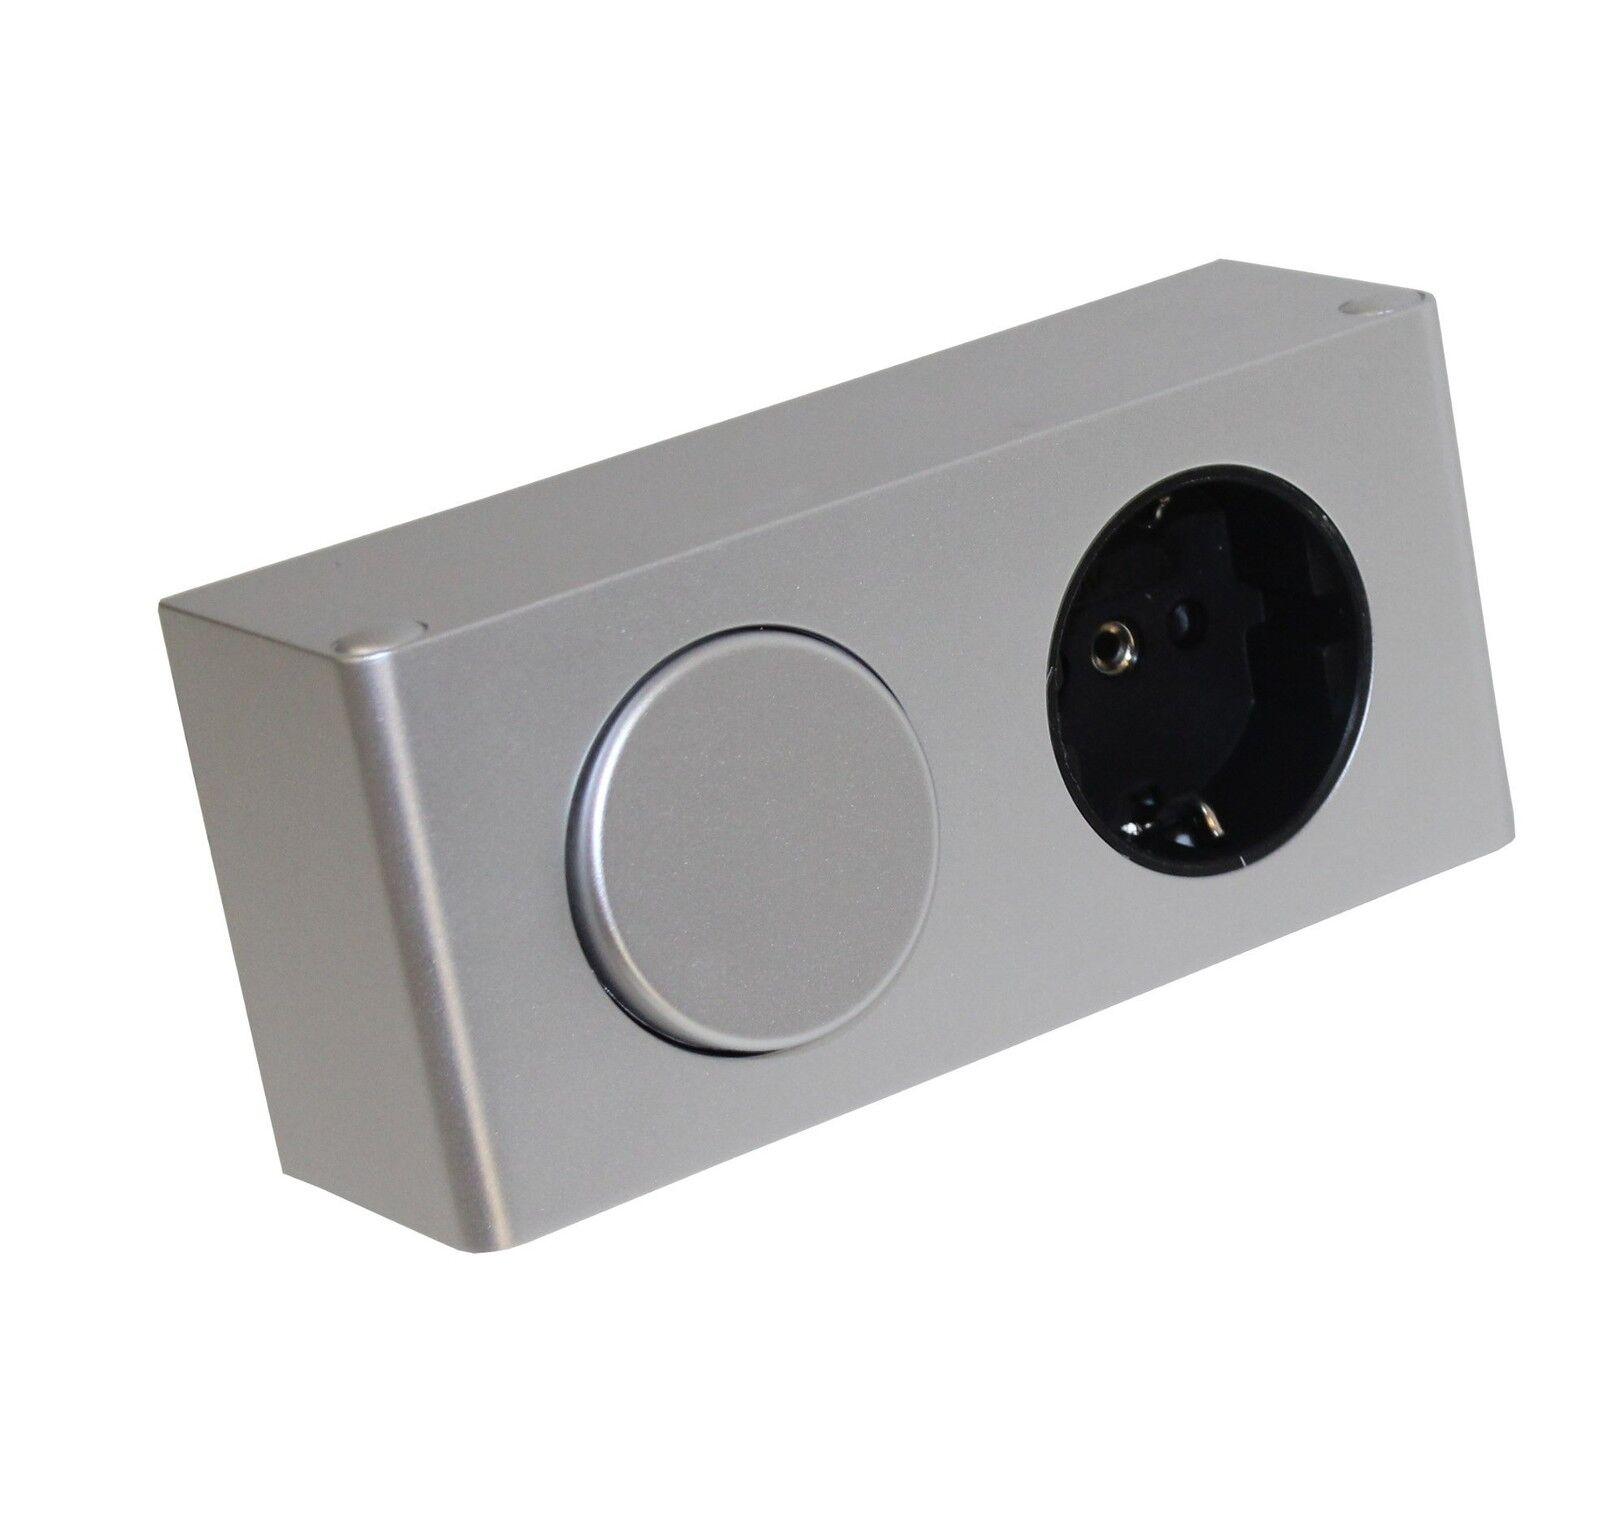 kombi box 230v mit schalter steckdose spiegelschrank m belbeleuchtung mod 4188 ebay. Black Bedroom Furniture Sets. Home Design Ideas